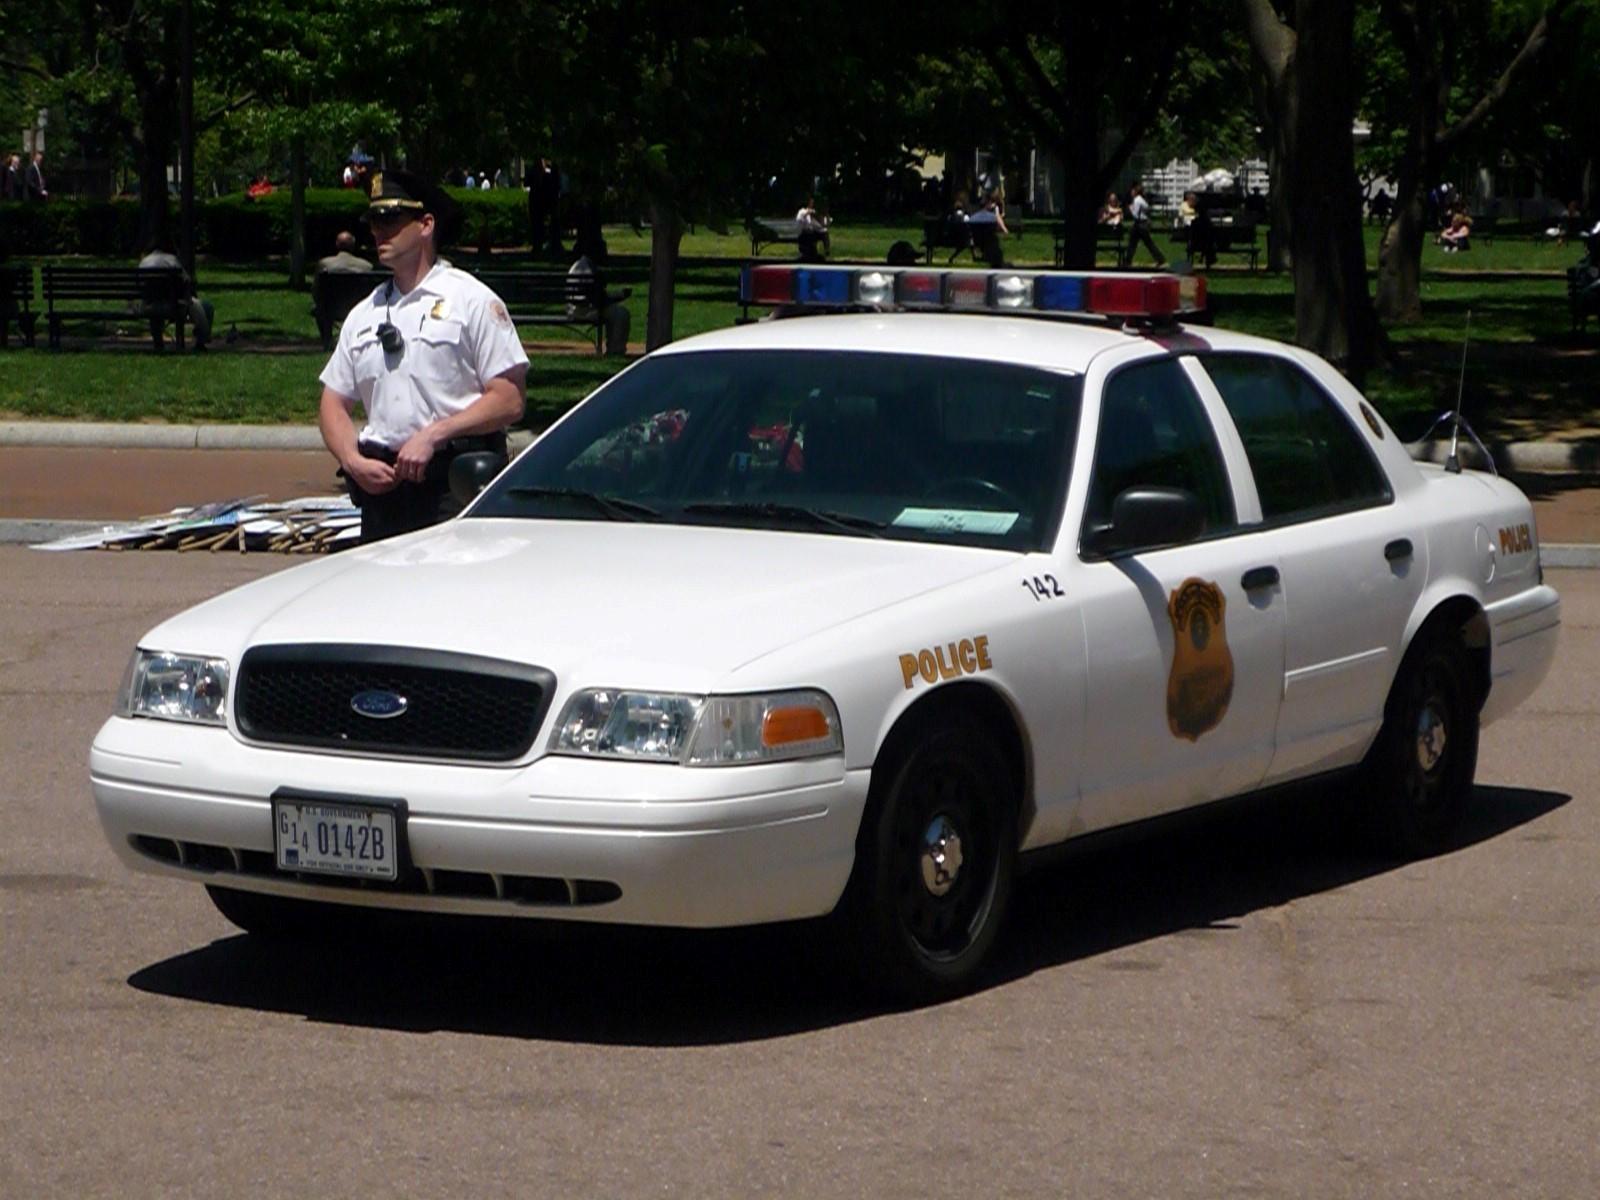 Fondos De Vehiculos: Policia Fondo De Pantalla And Fondo De Escritorio